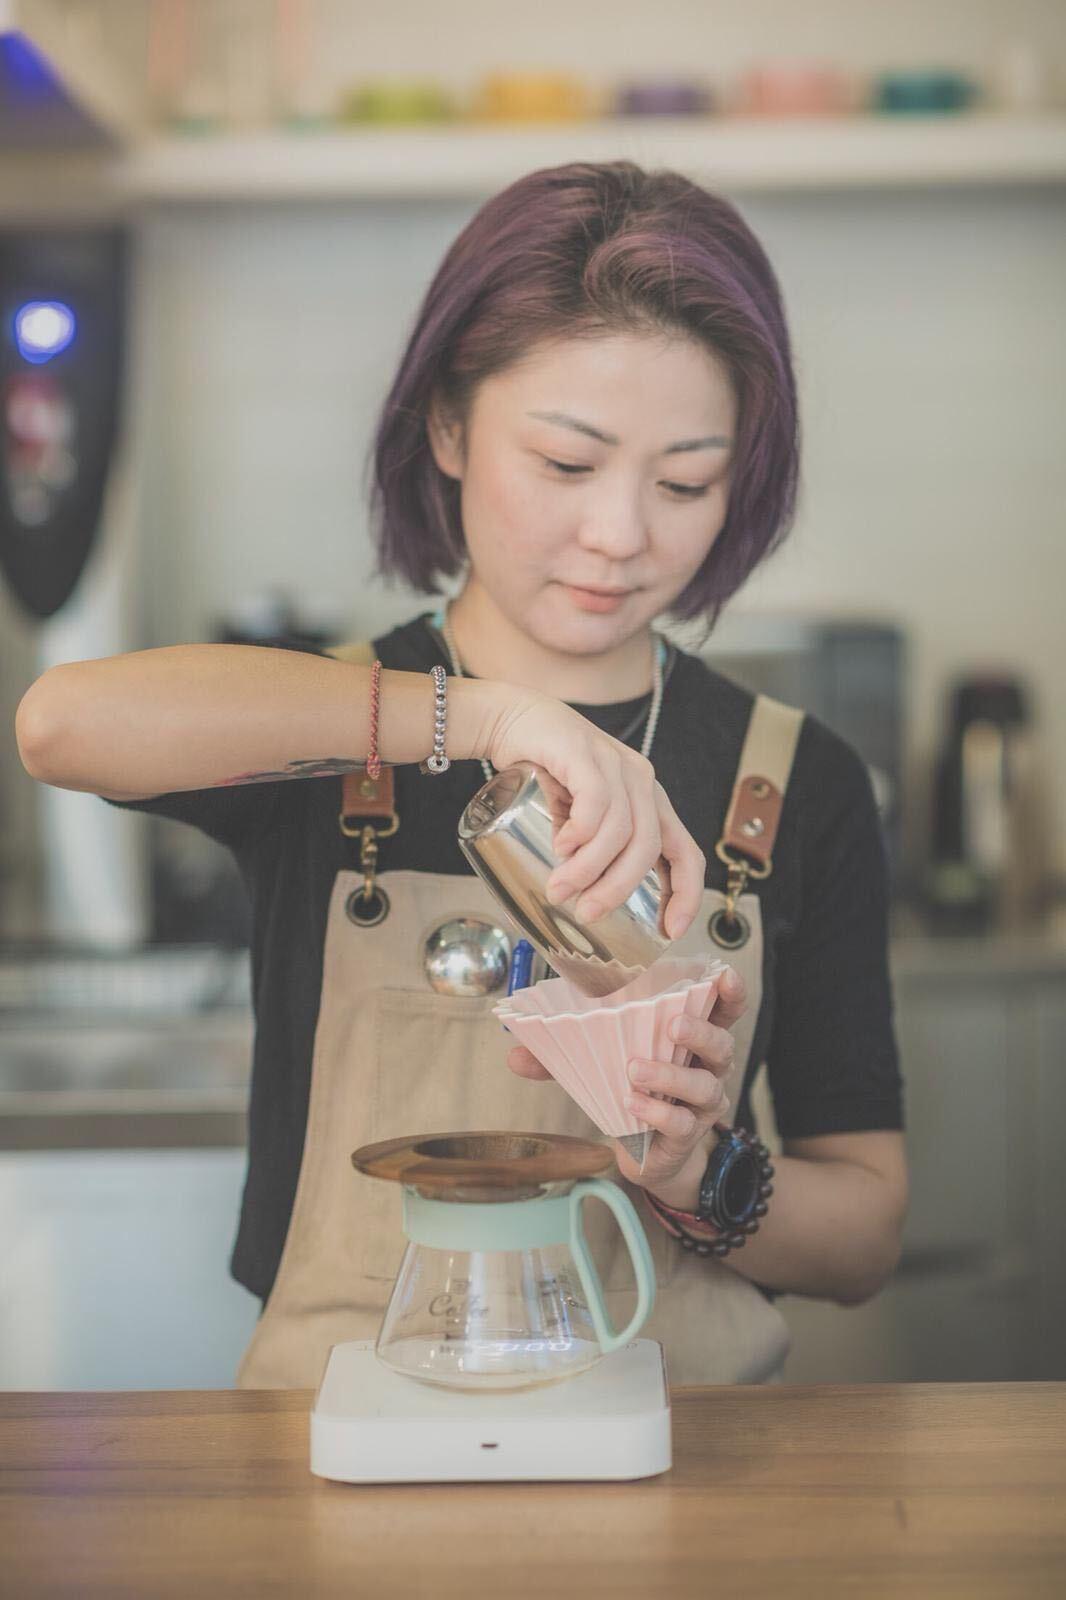 Mandy Mok barista 在咖啡店內 開心沖咖啡 咖啡師學徒 Liz coffee